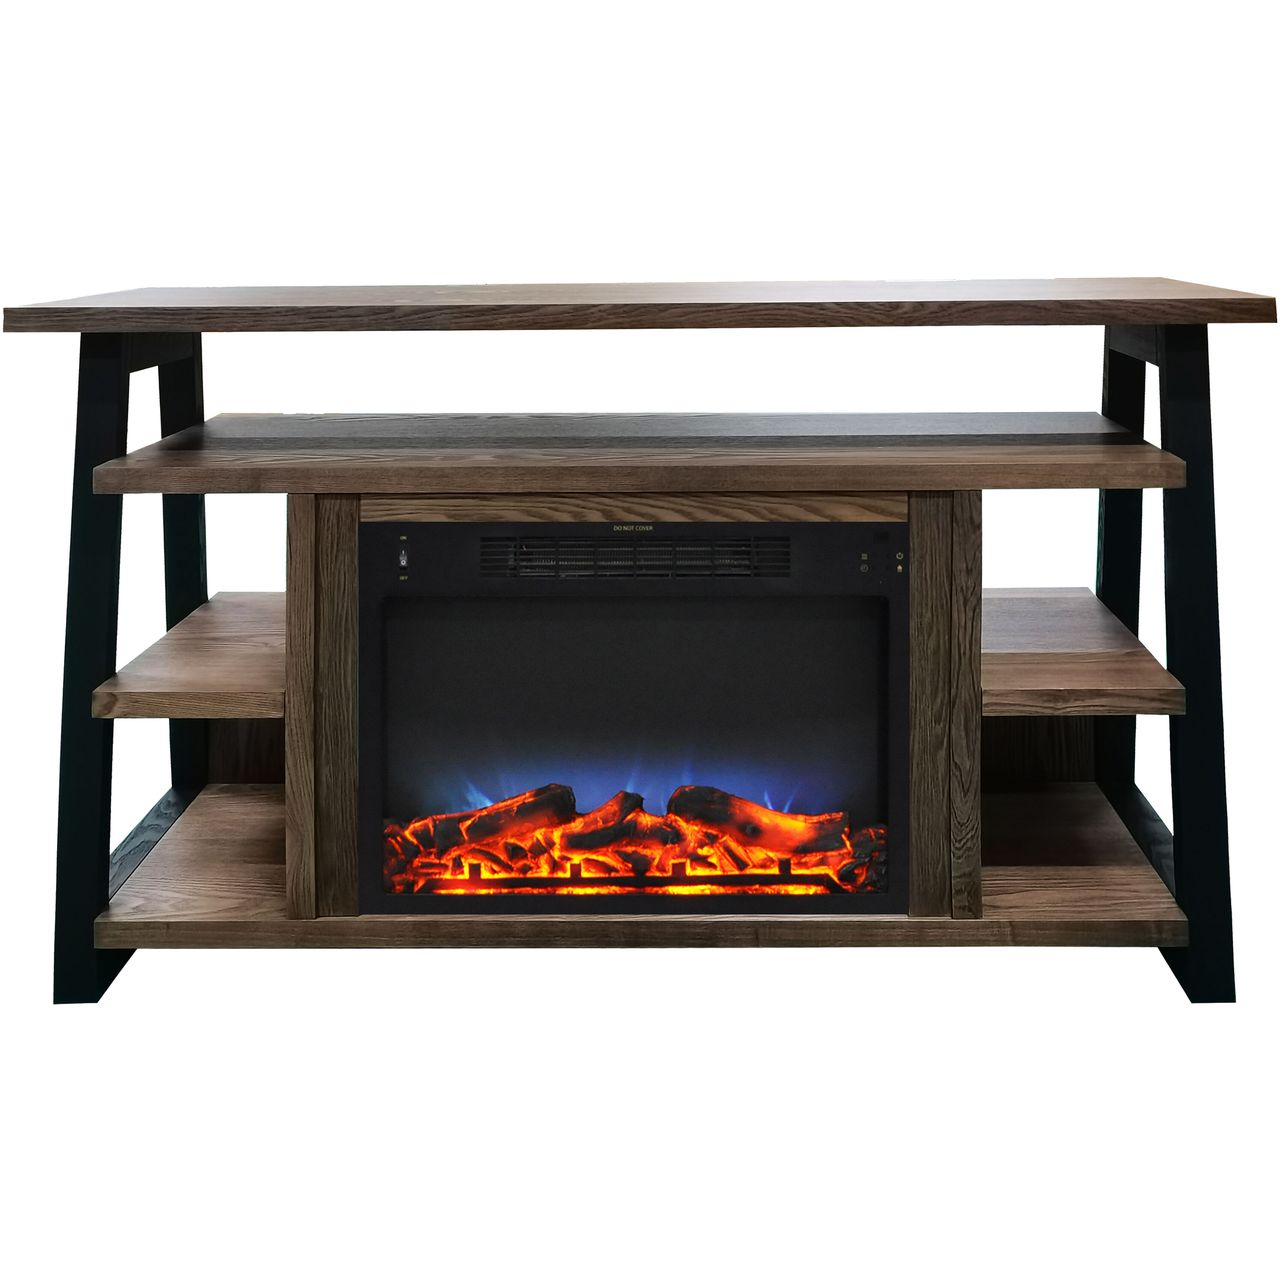 "Cambridge 32"" Sawyer Electric Fireplace Mantel/Logs/LED Flame - Walnut"